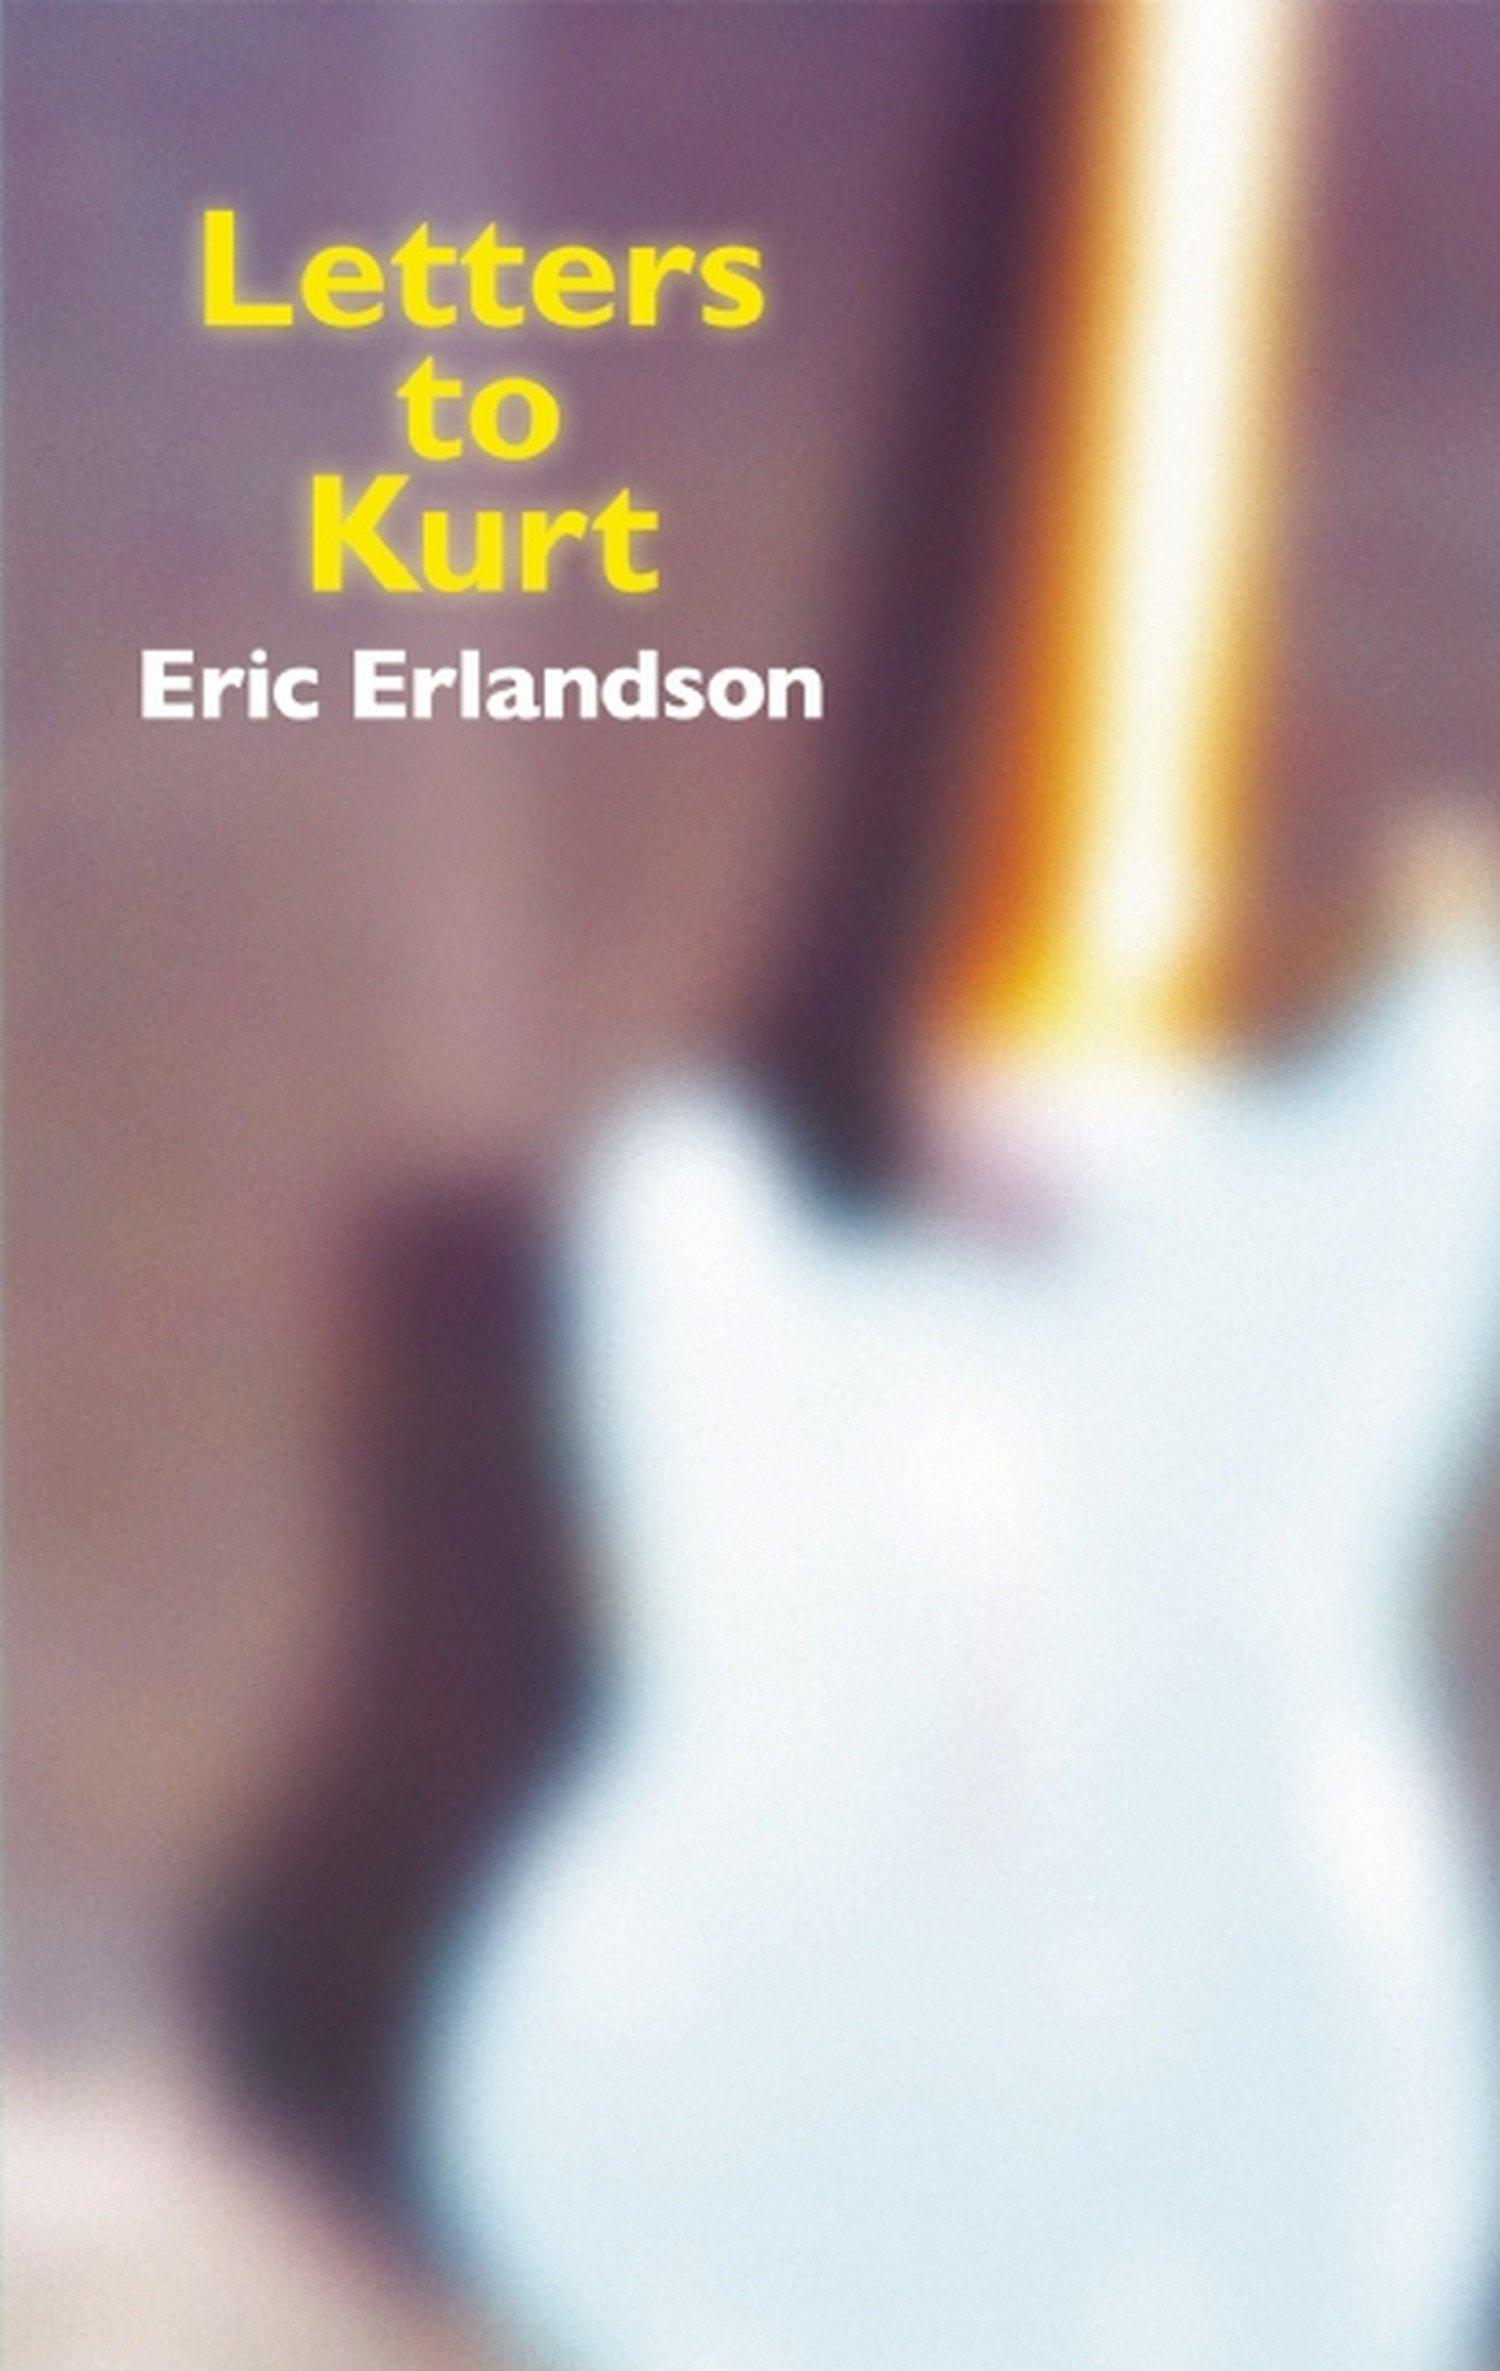 Letters To Kurt Eric Erlandson 9781617750830 Amazon Com Books